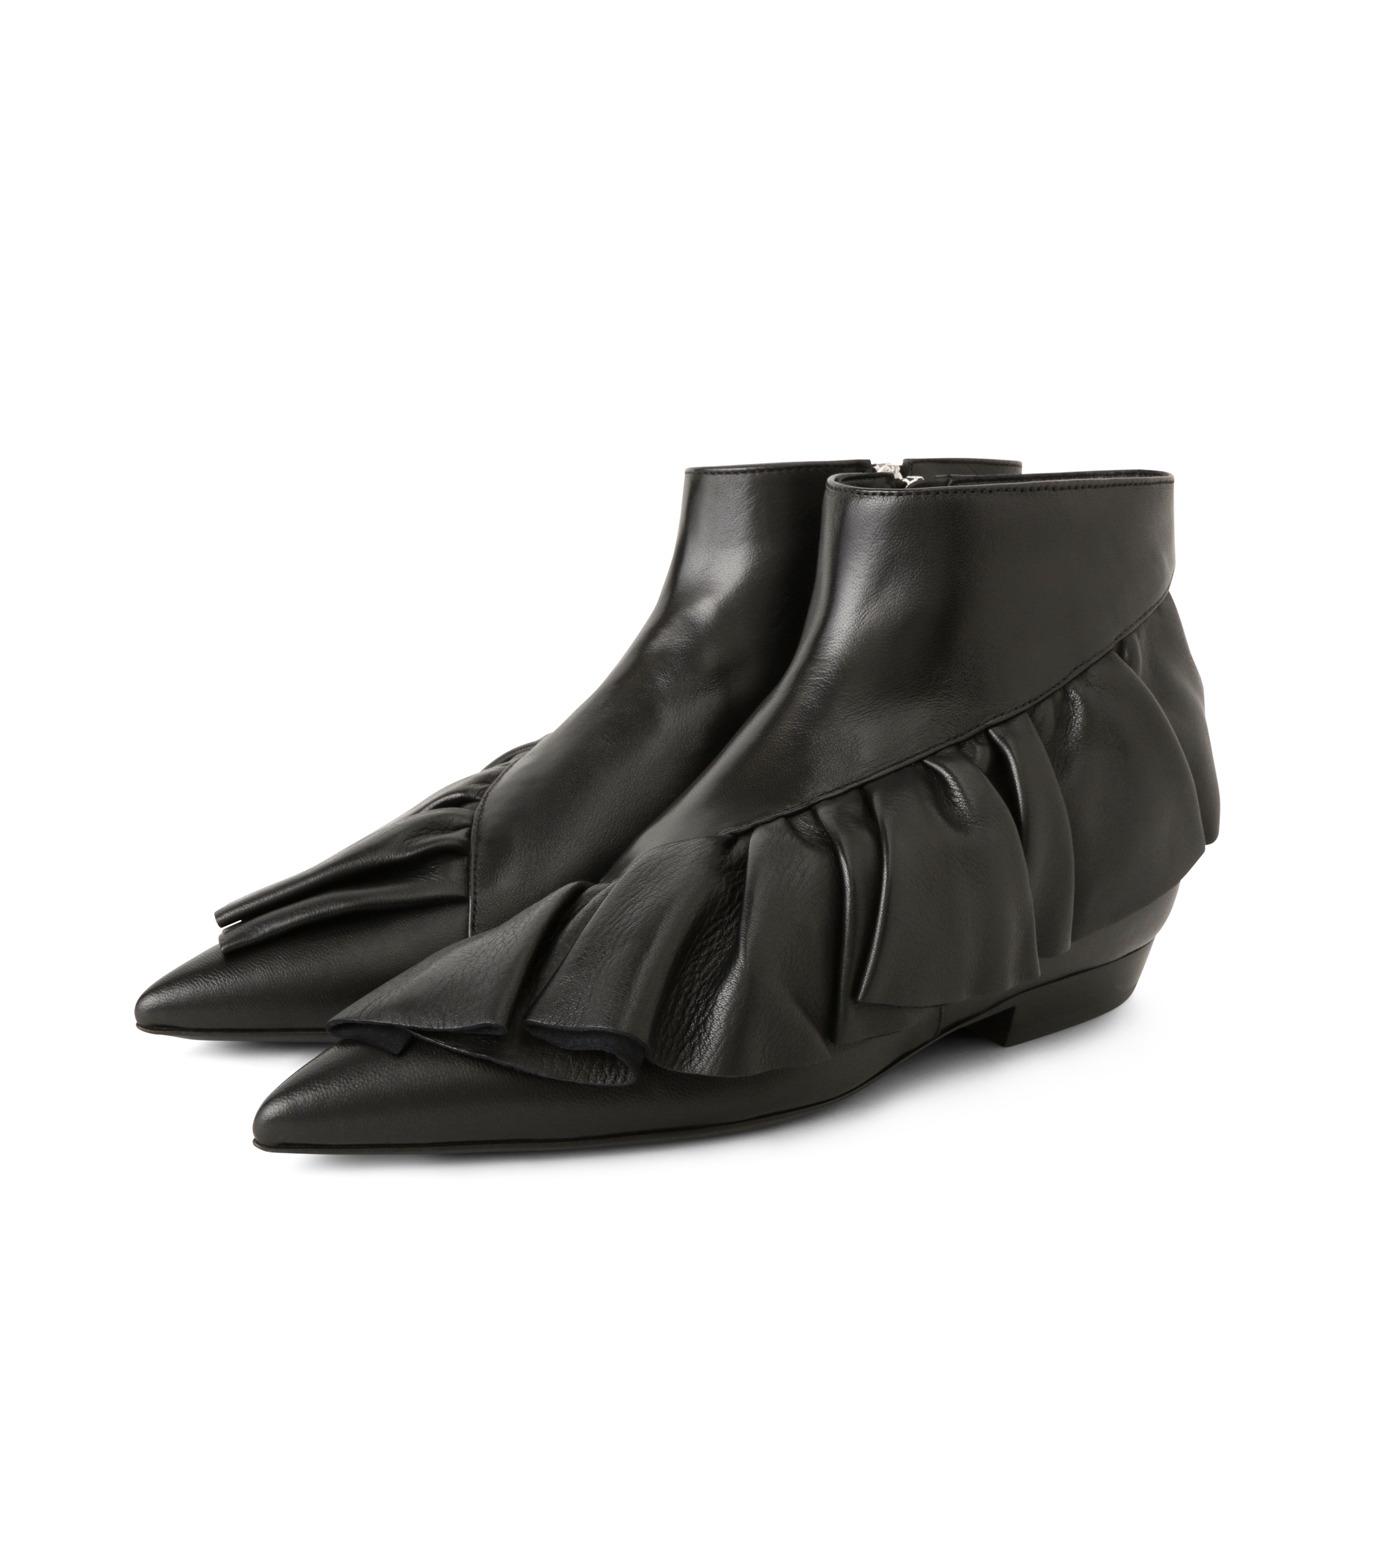 J.W.Anderson(ジェイダブリュー アンダーソン)のRuffle Bootie-BLACK(ブーツ/boots)-JWAFW01C-13 拡大詳細画像3